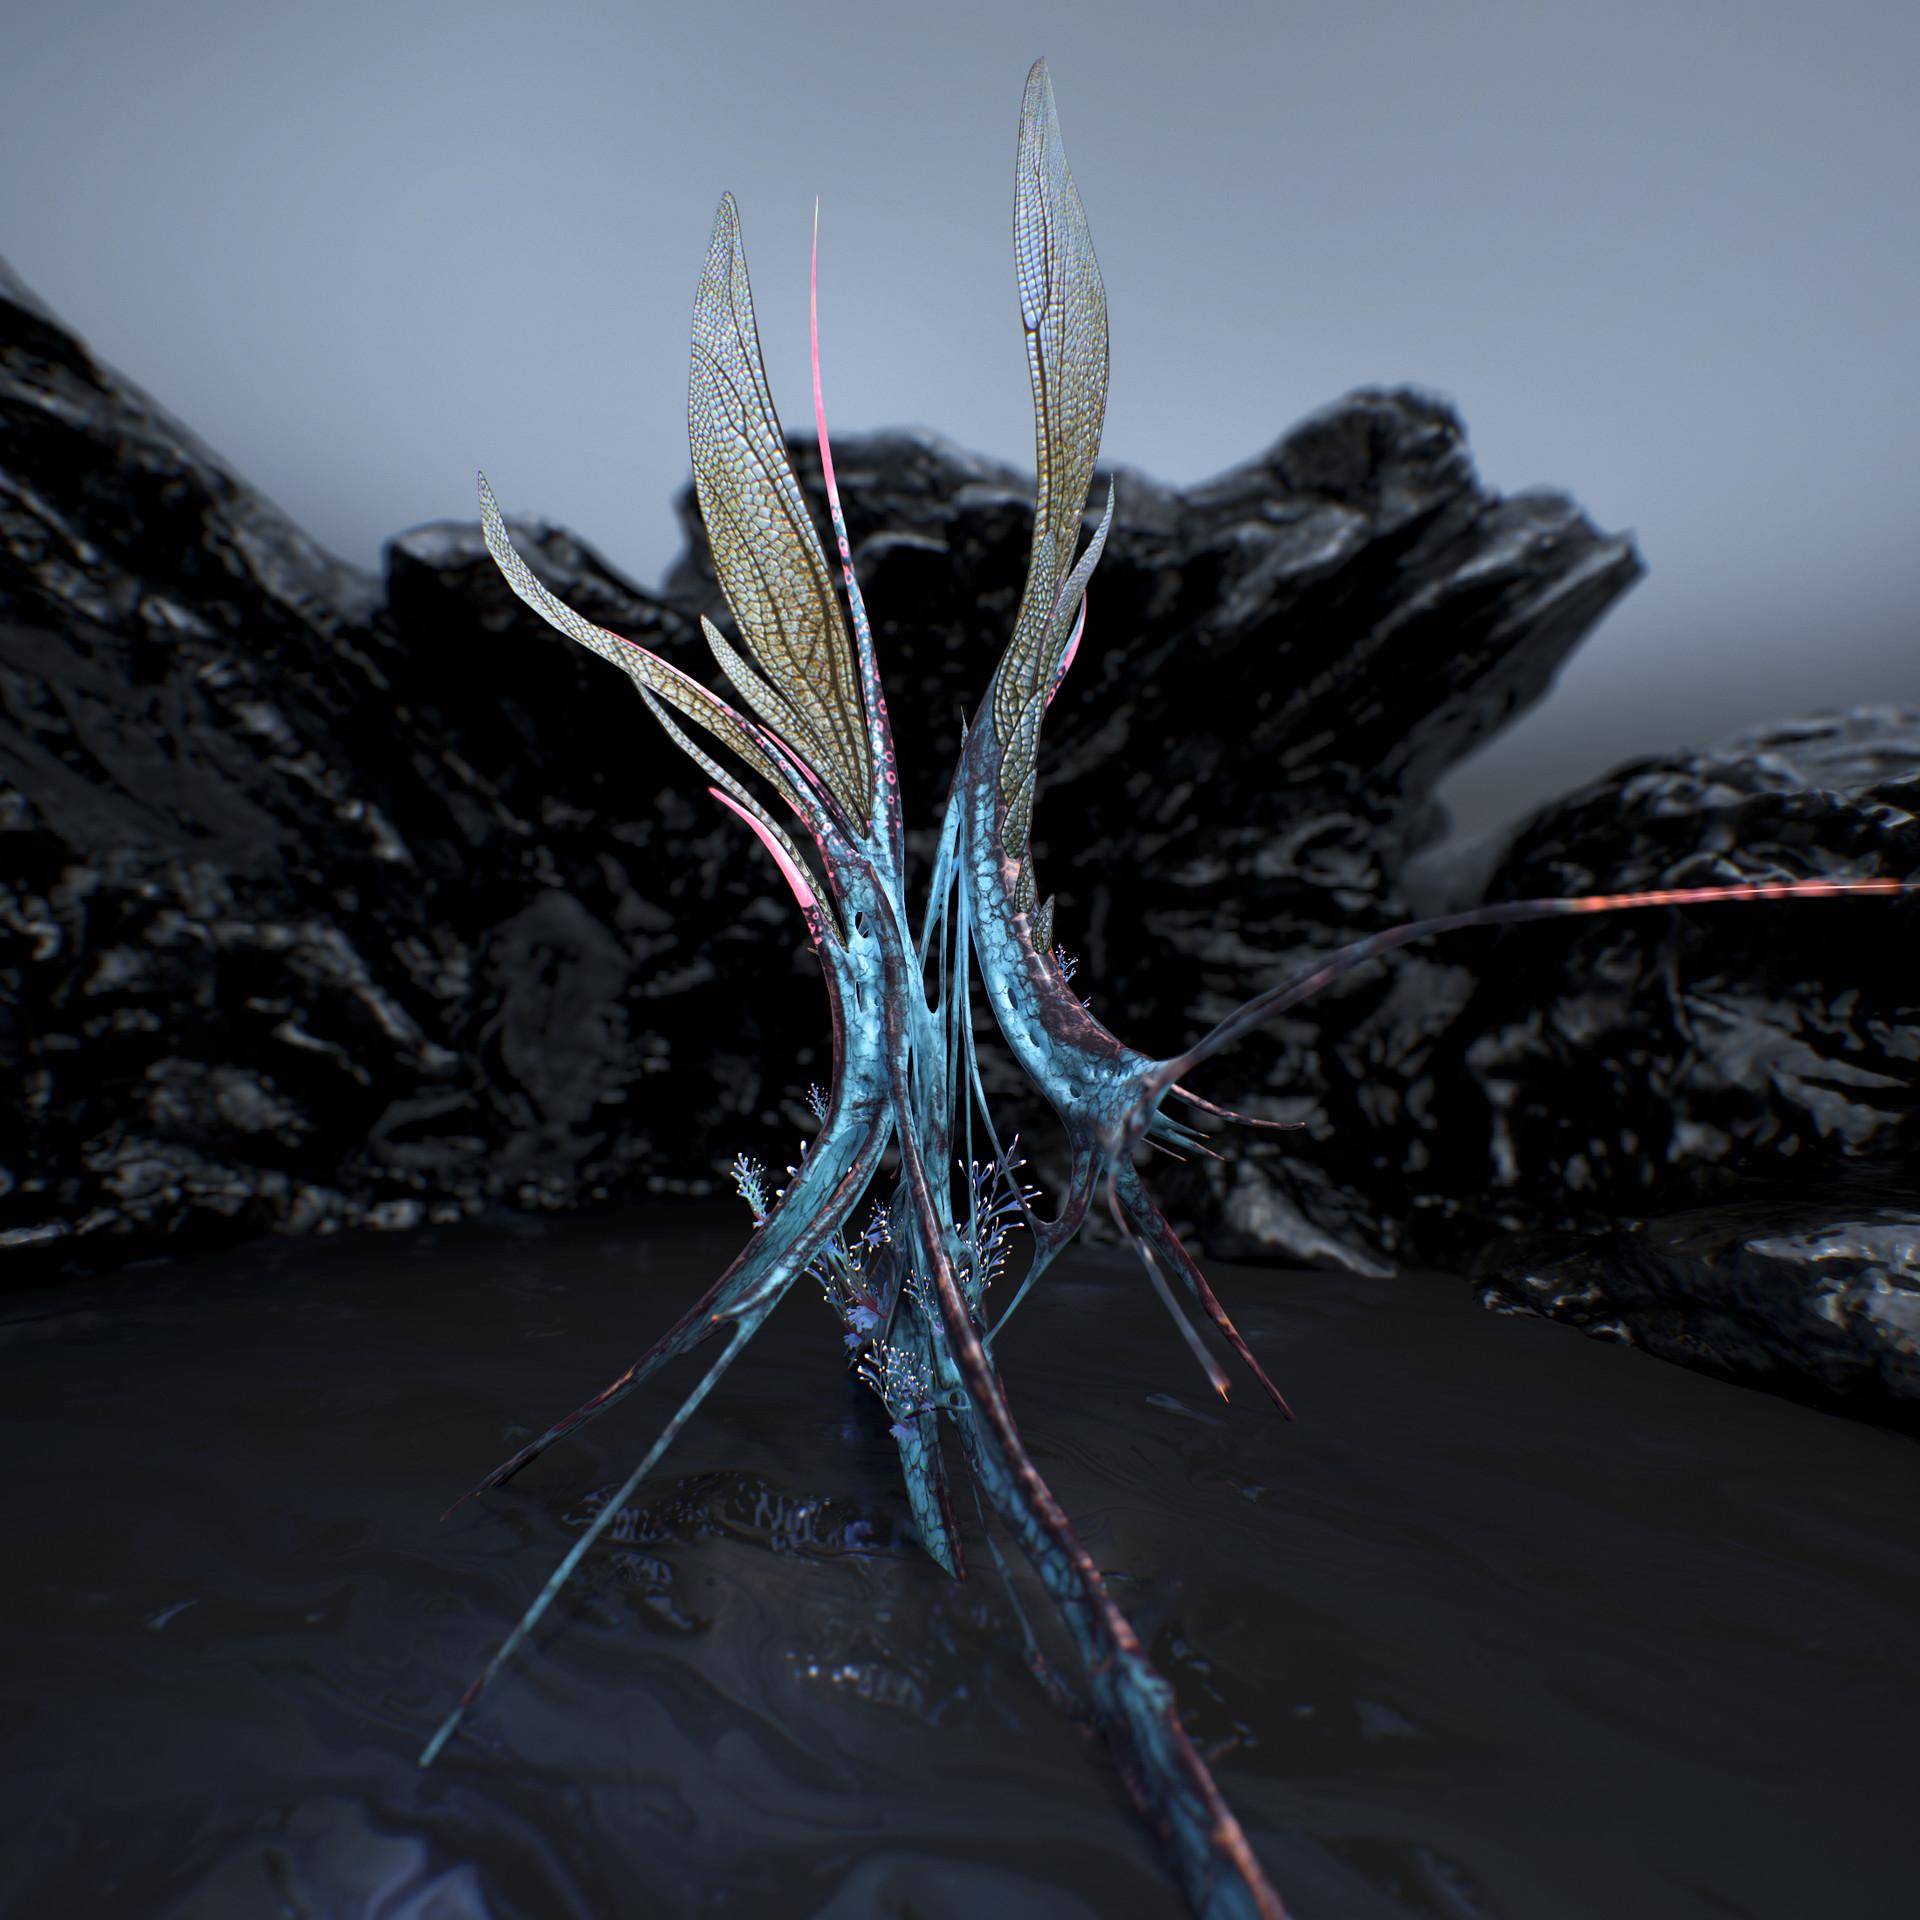 Johan de leenheer alien fern misota spletinus54